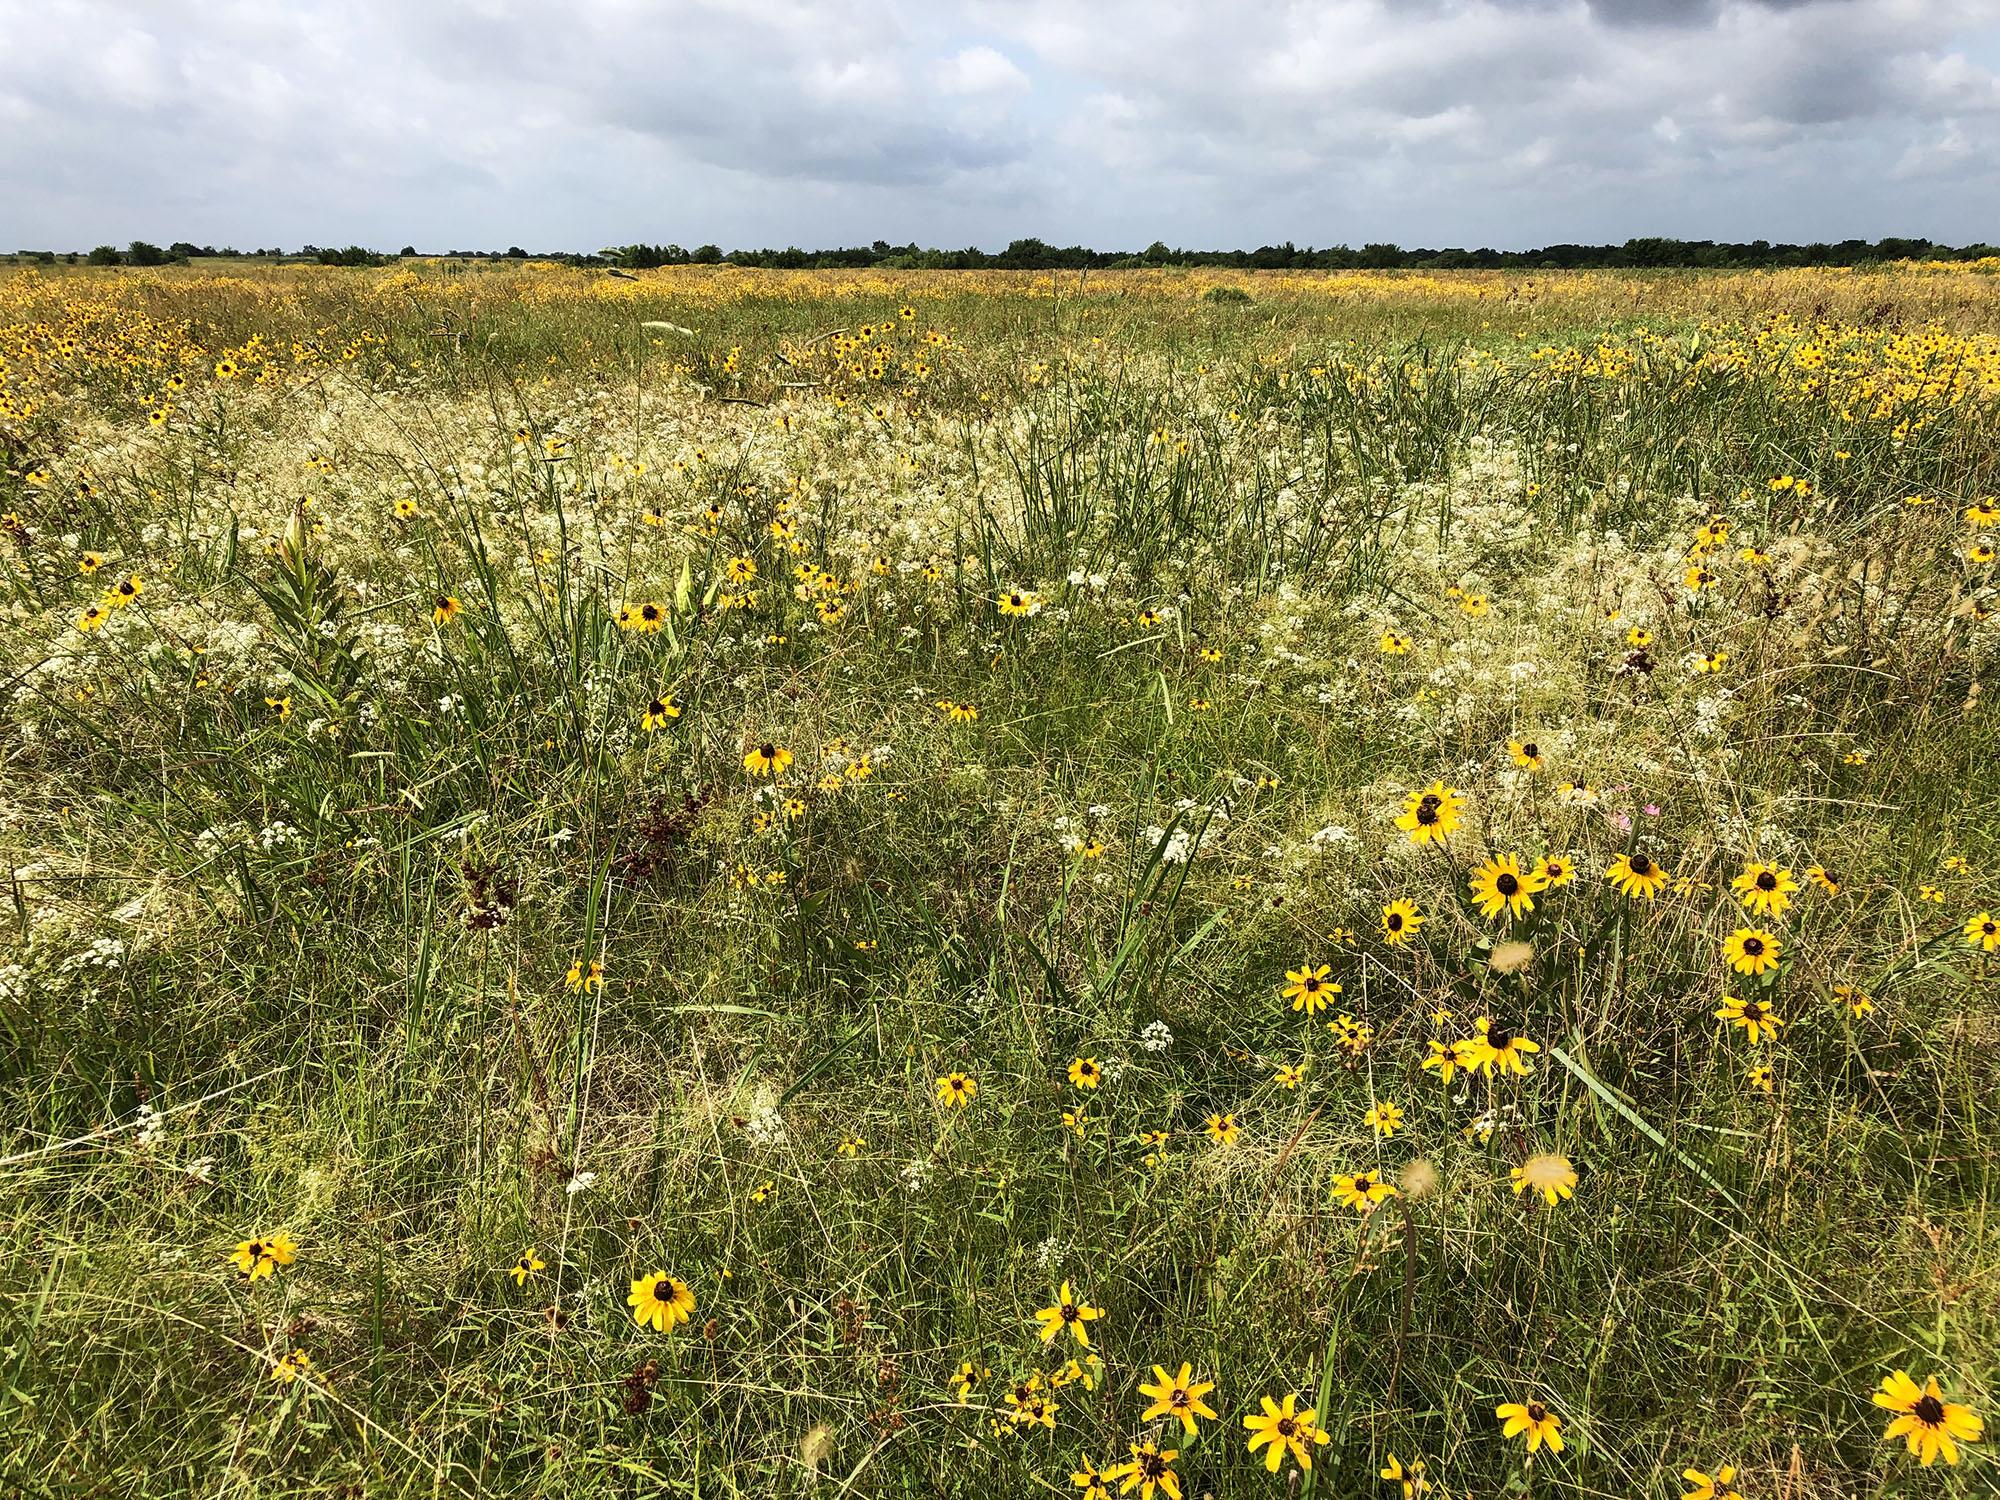 Daphne Prairie in June